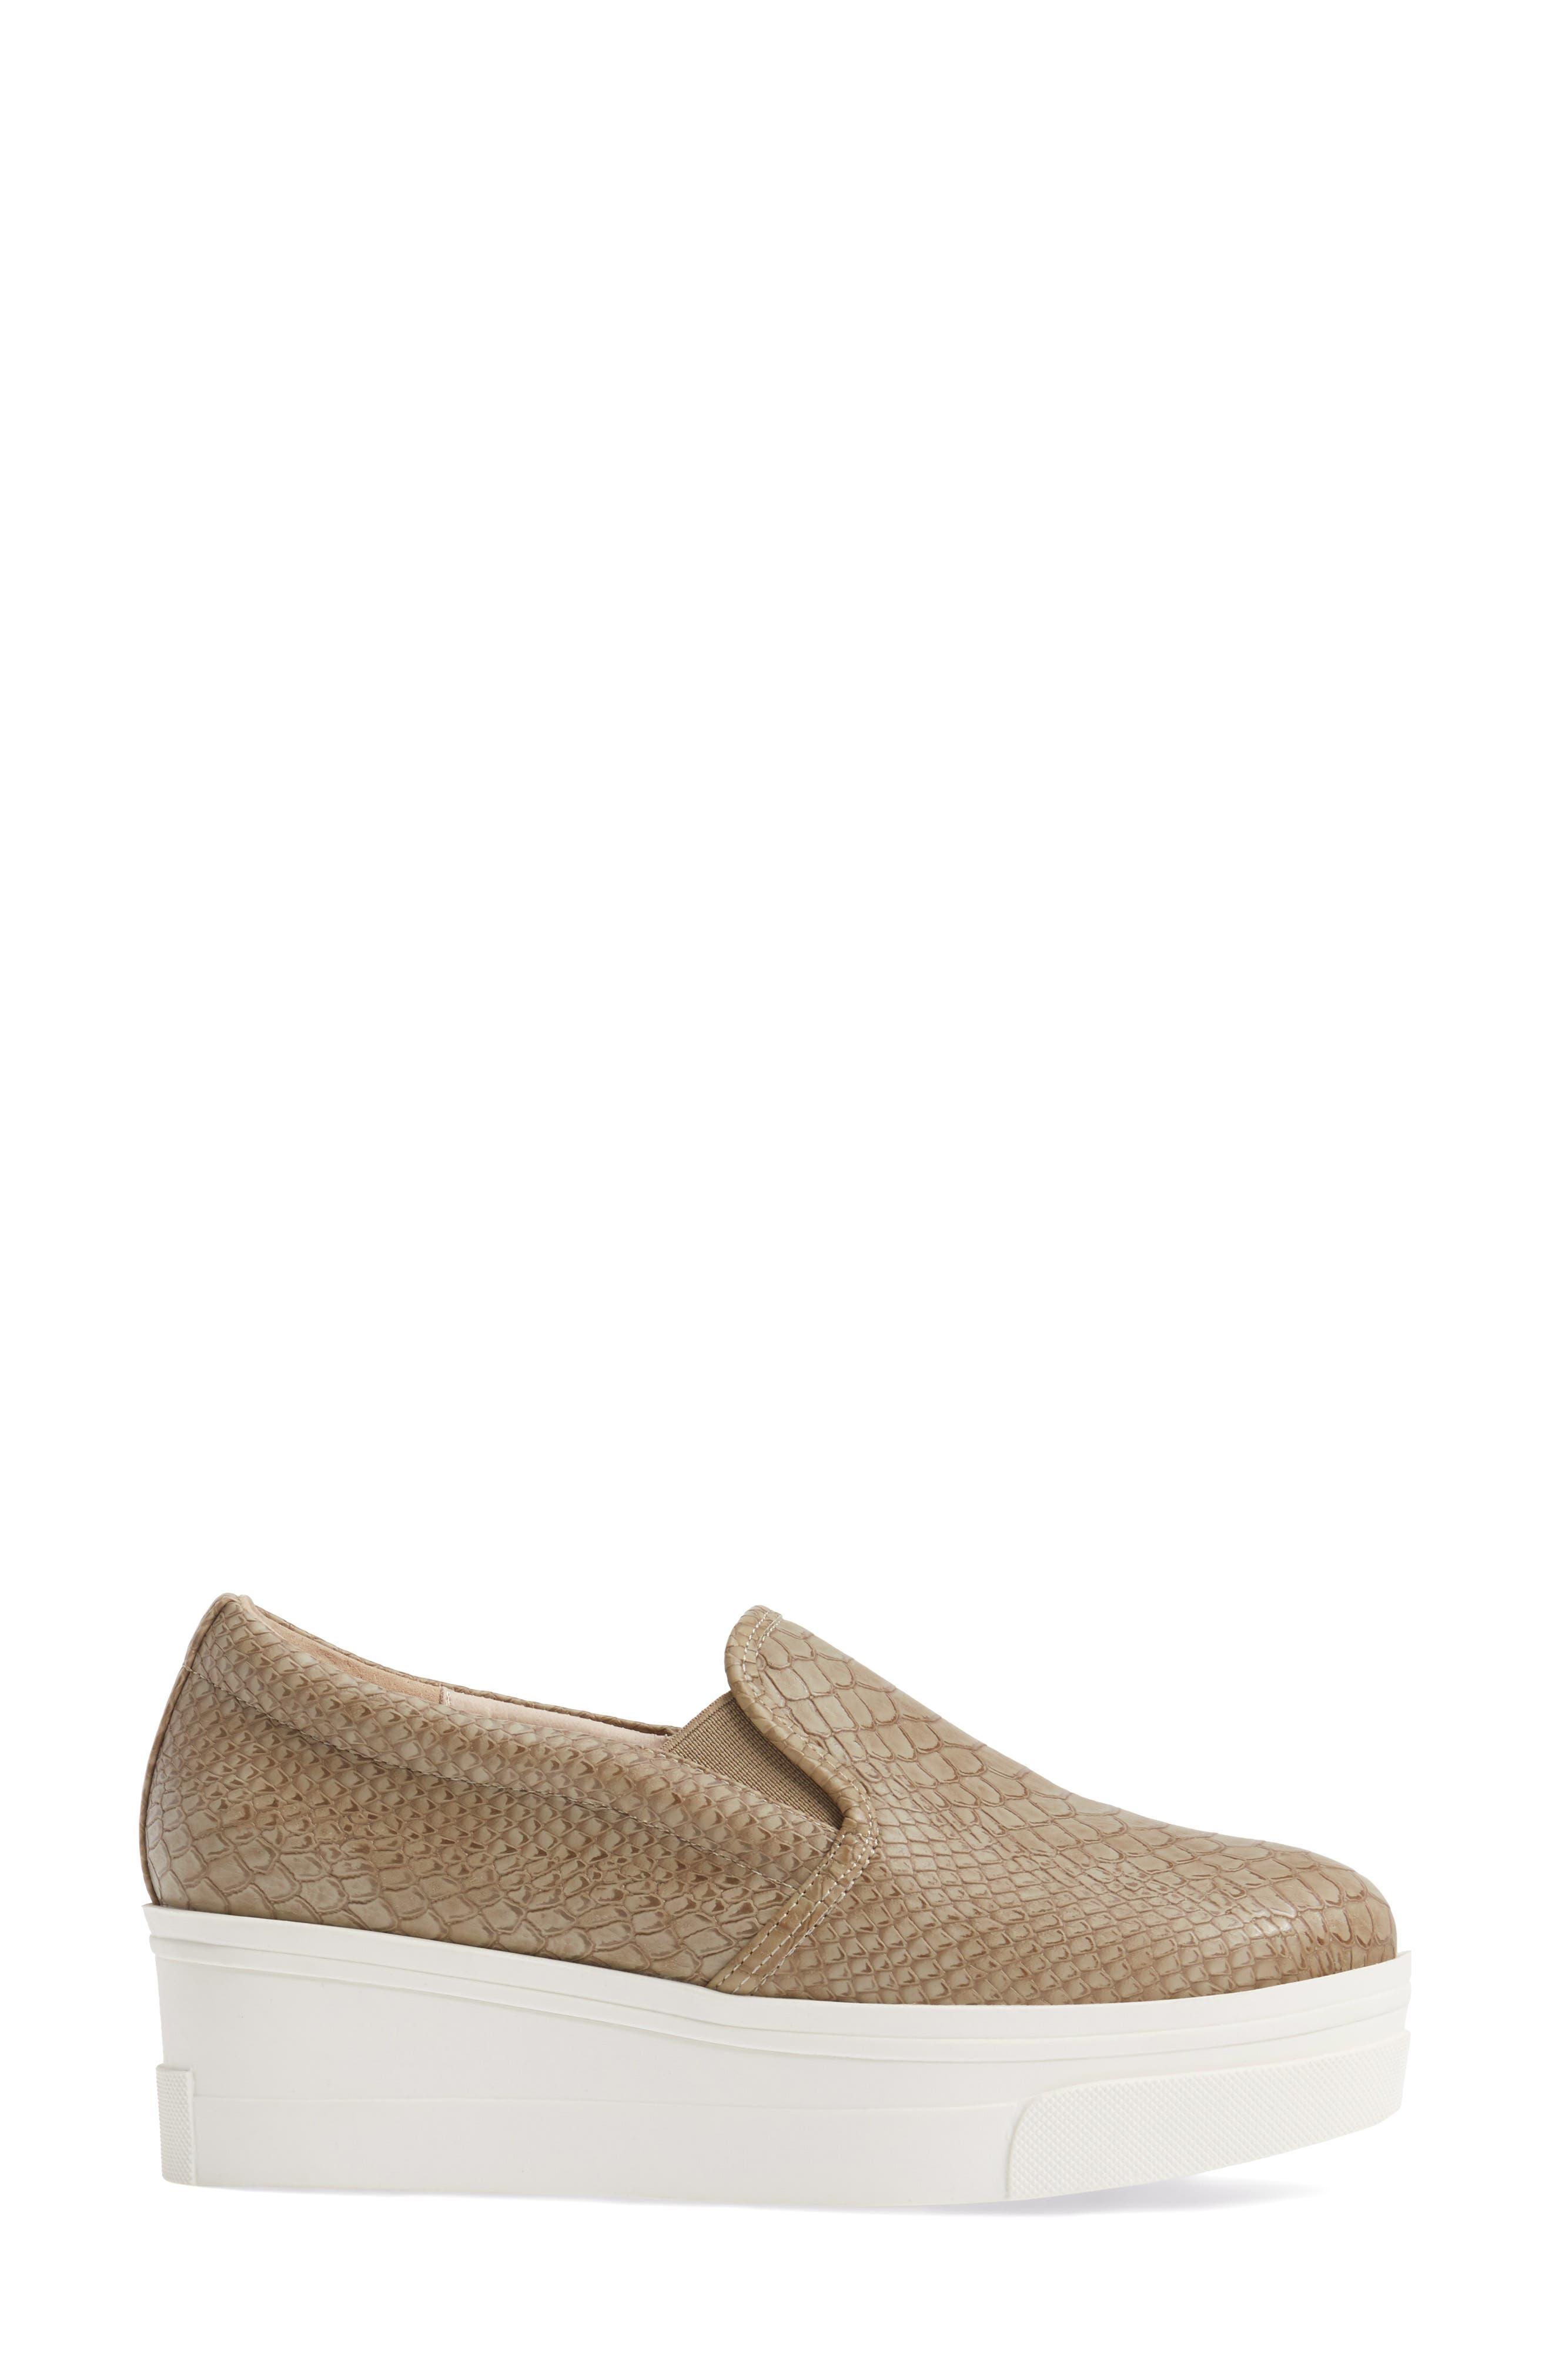 Alternate Image 3  - JSlides Genna Slip-On Sneaker (Women)